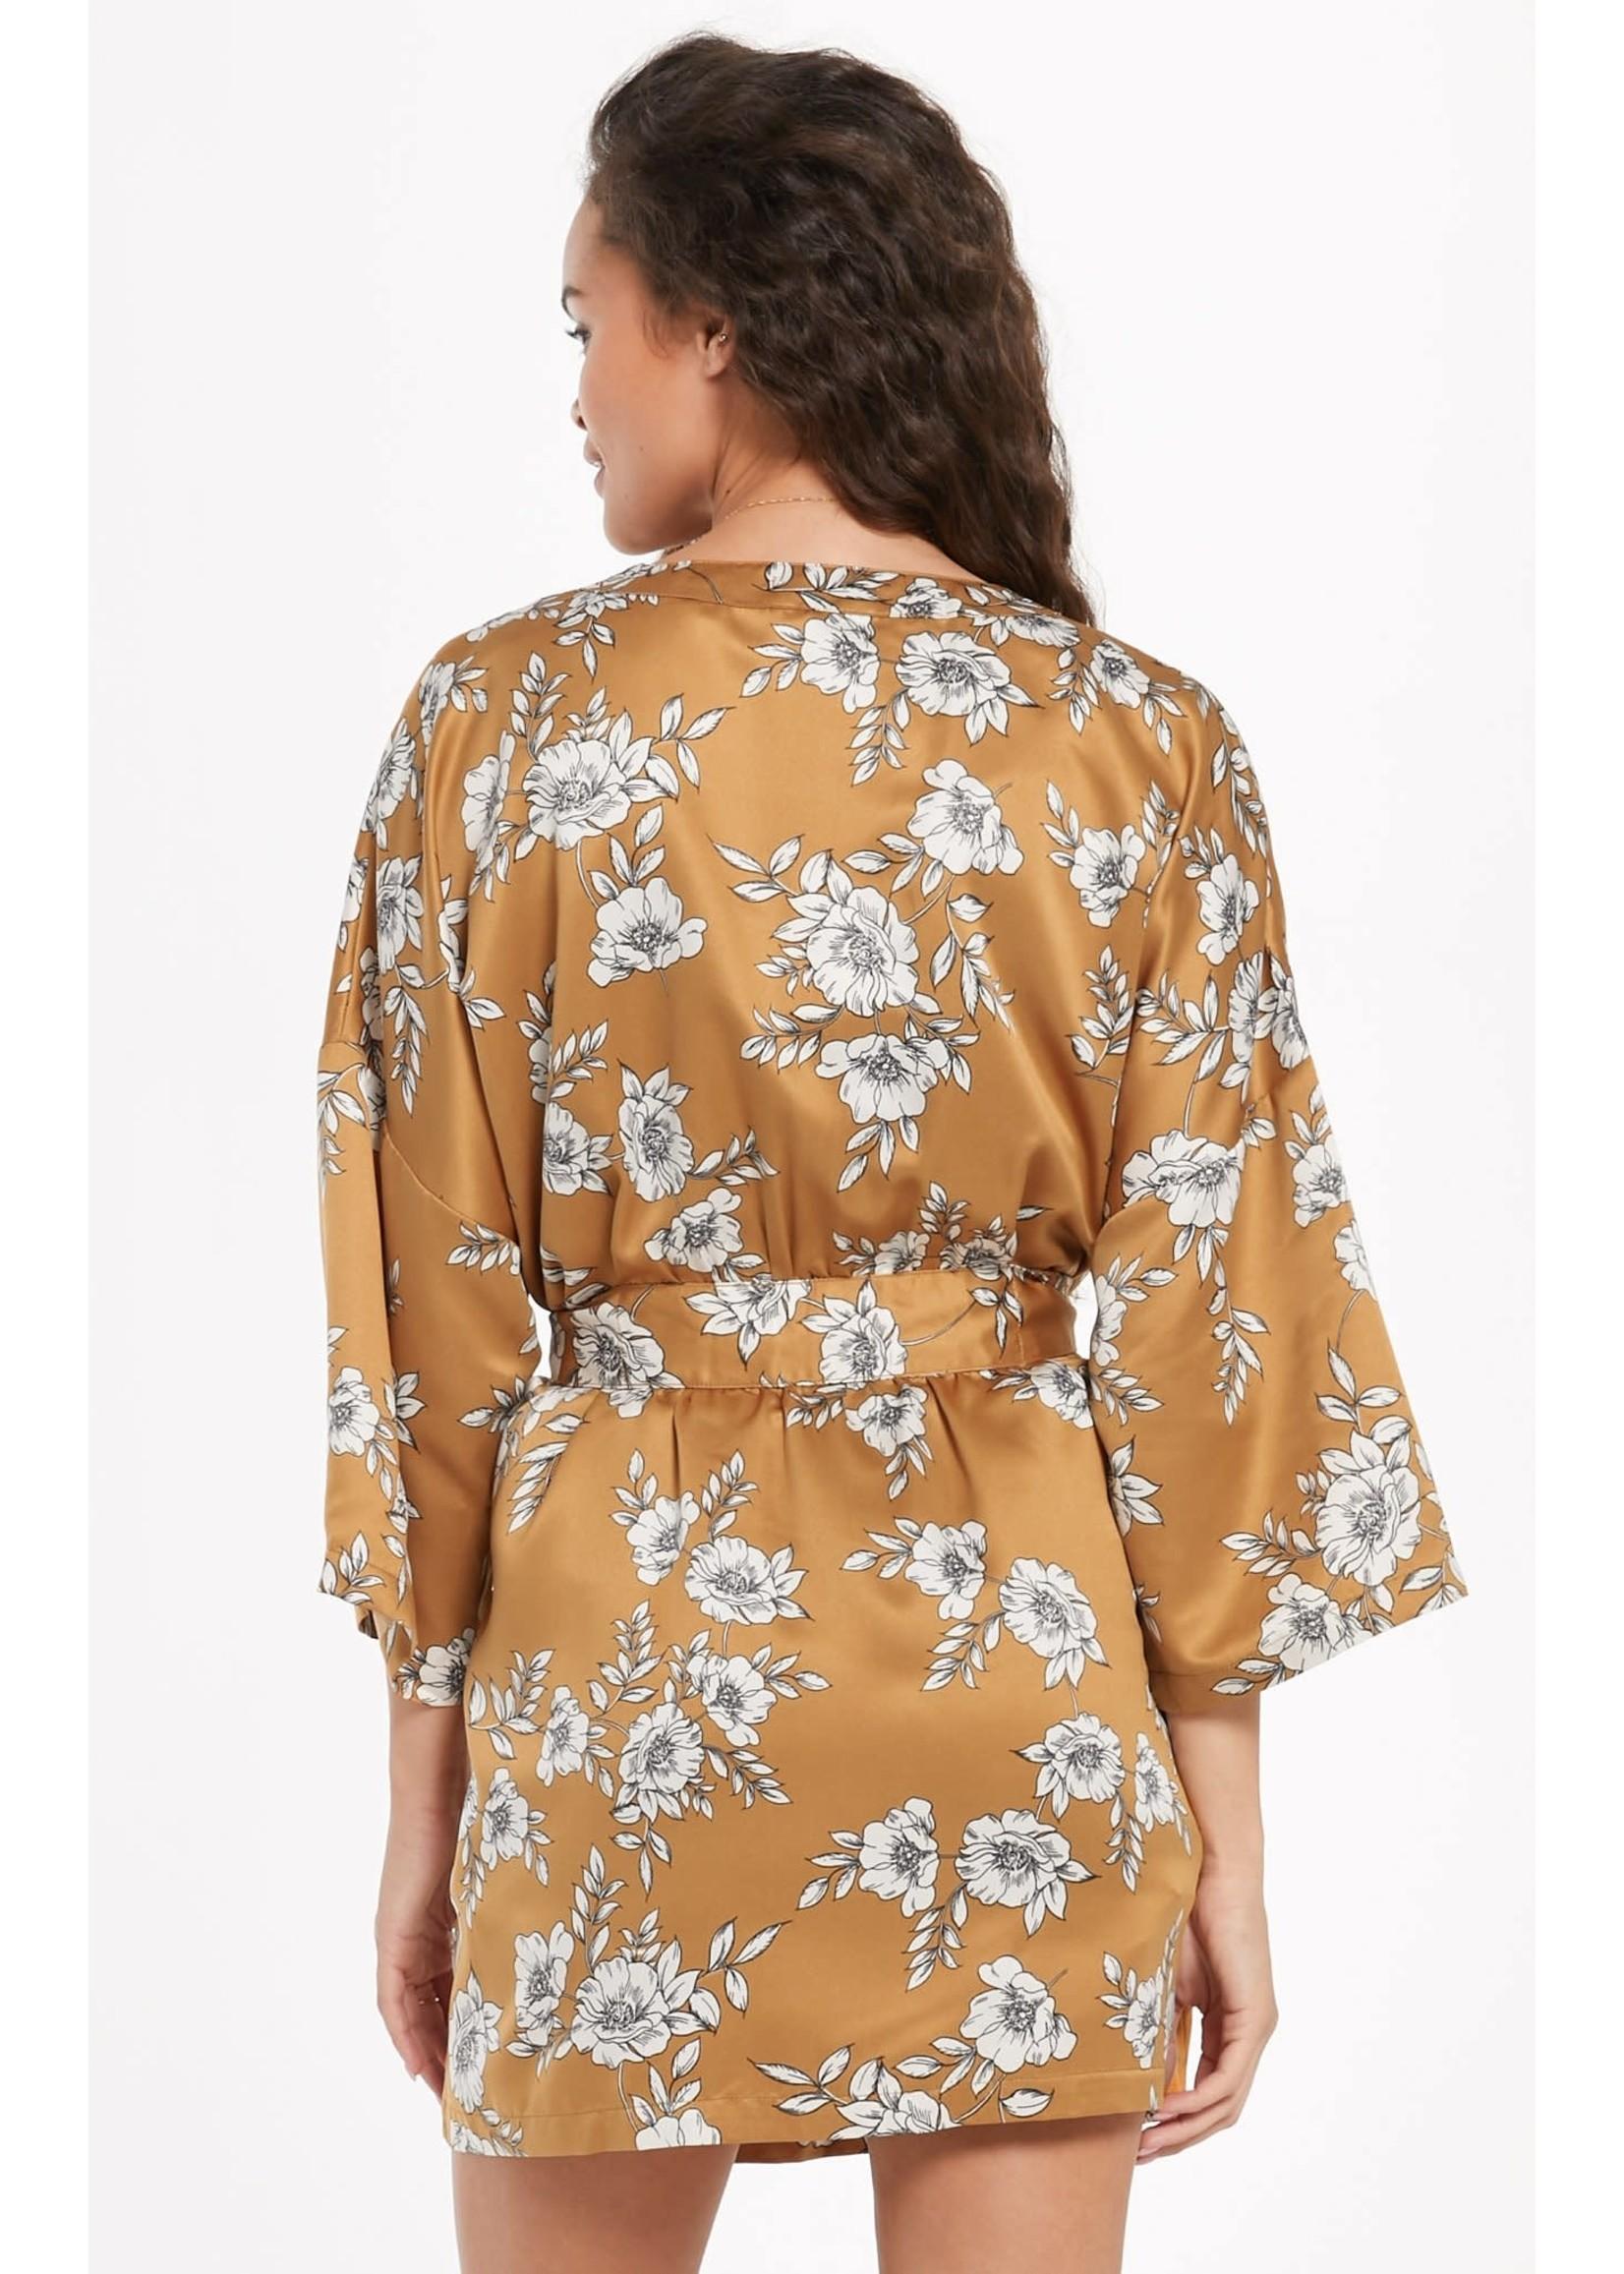 Z Supply Vacay Floral Satin Robe